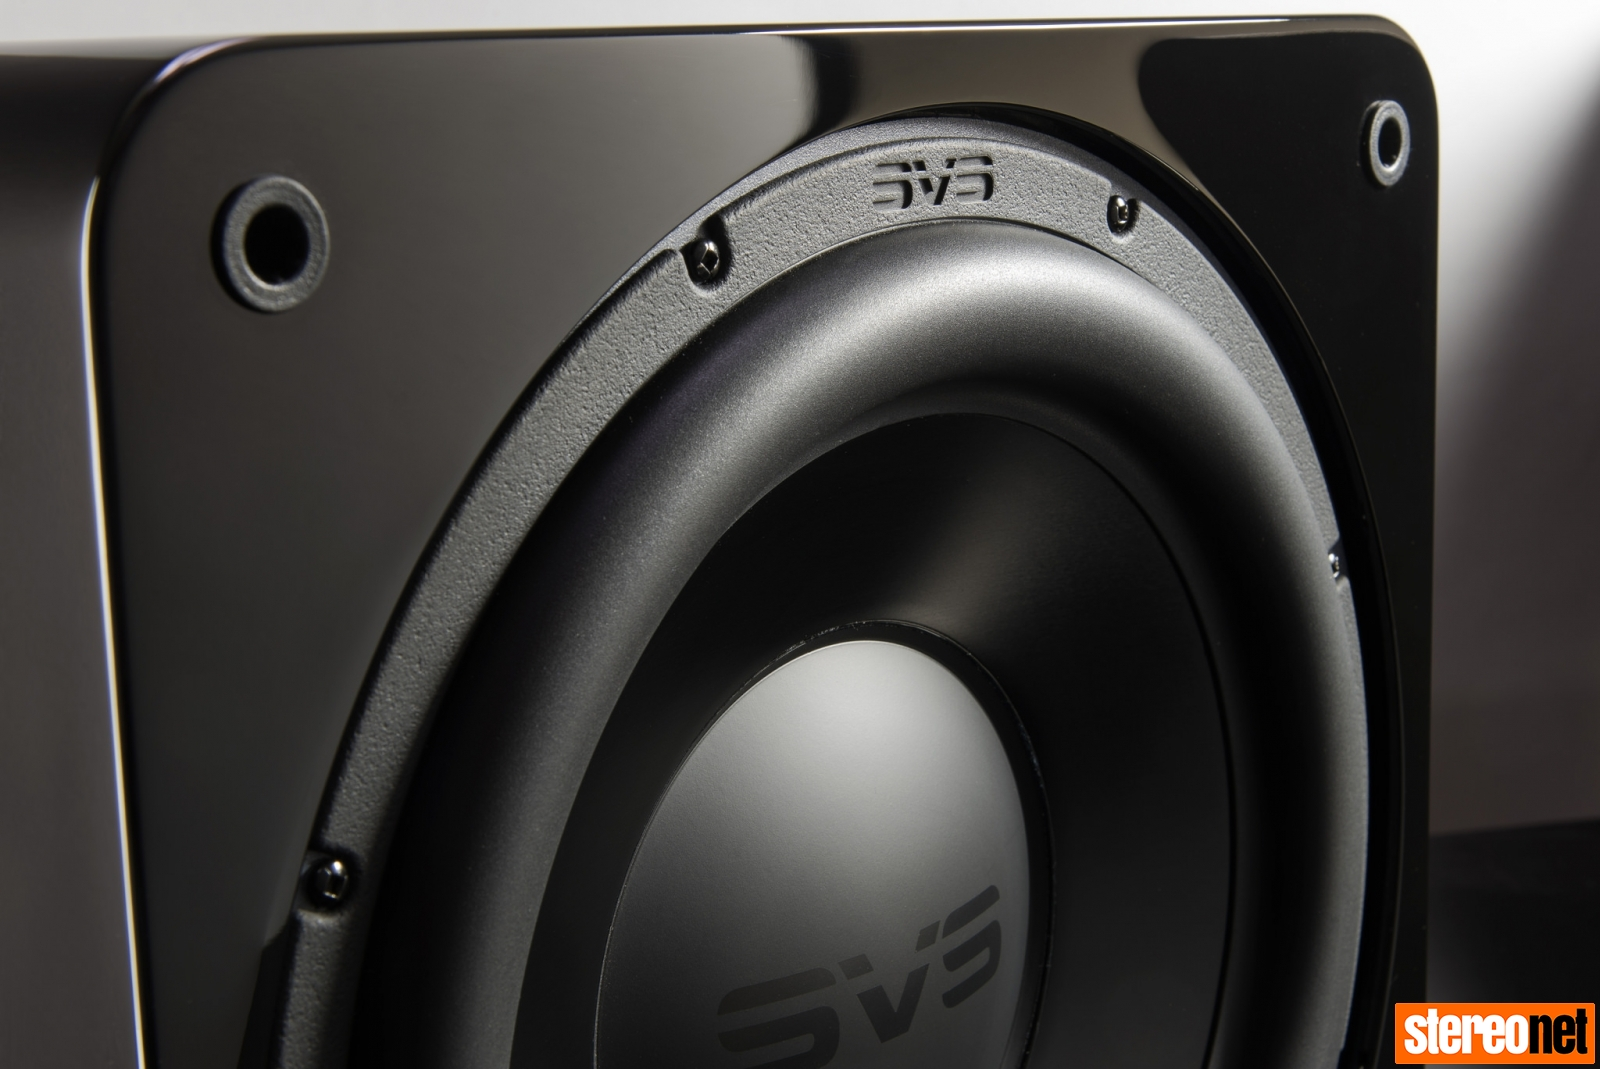 SVS 3000 Series sub